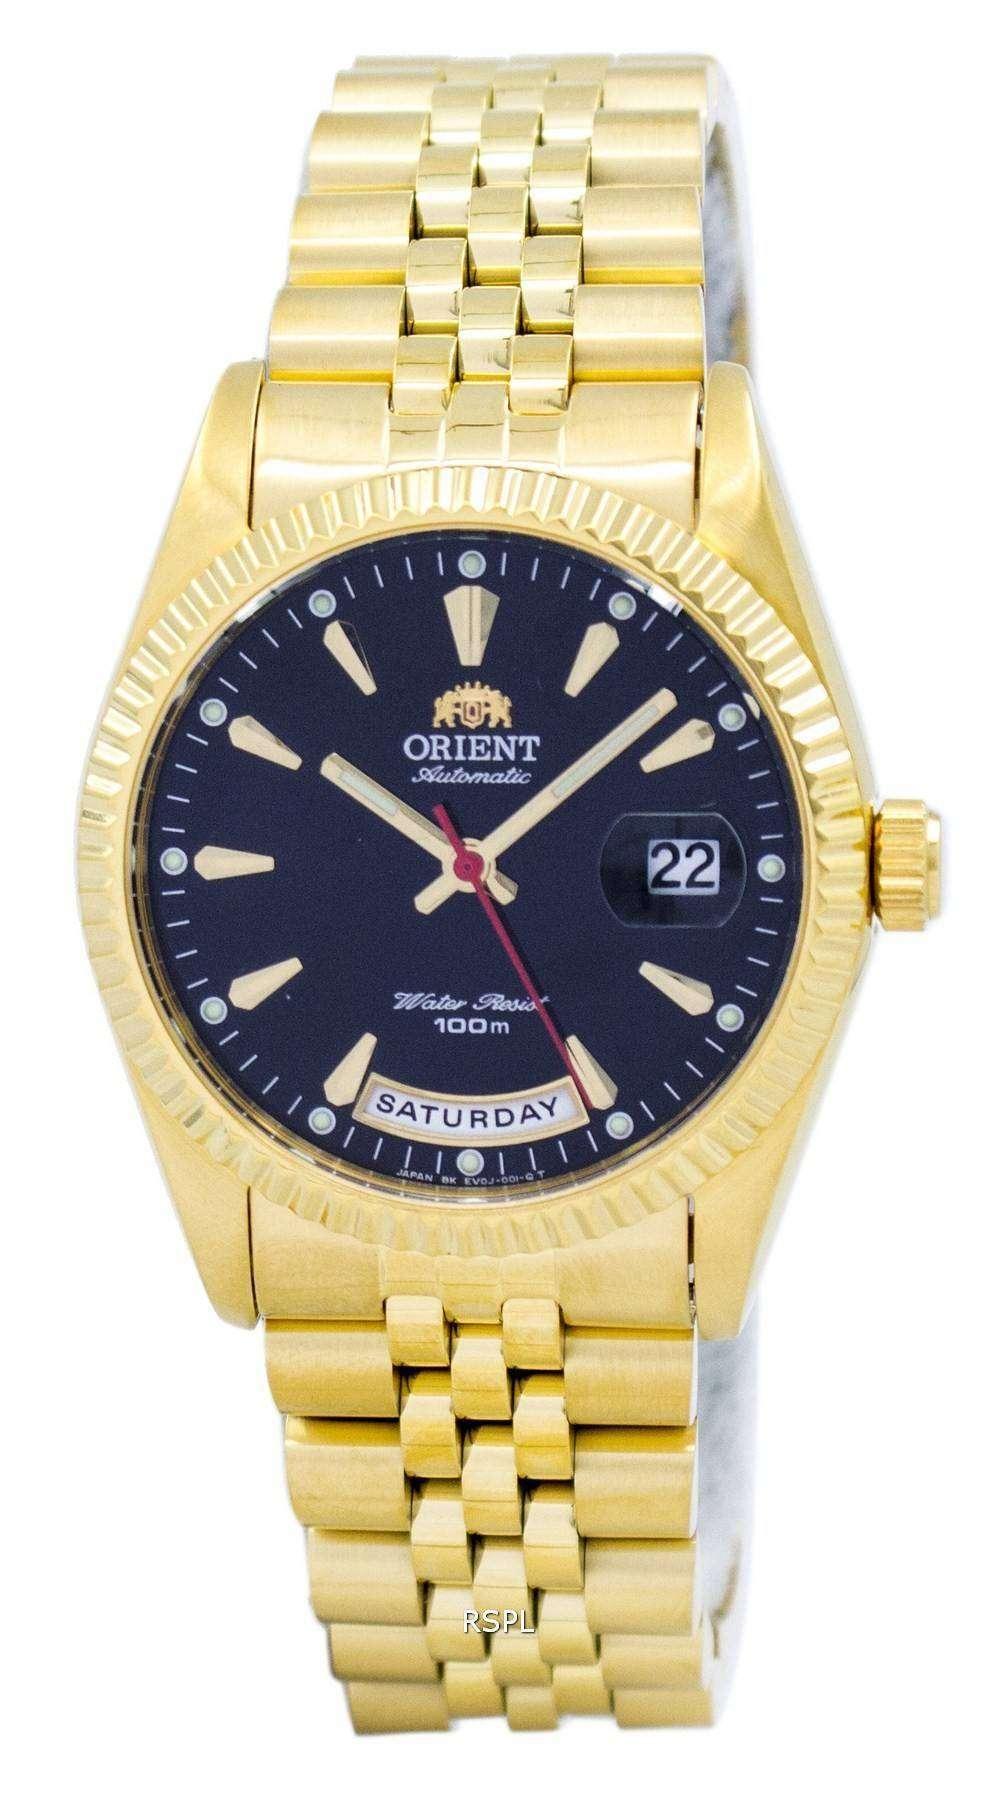 SEV0J004BH メンズ腕時計 orient オイスター自動日本